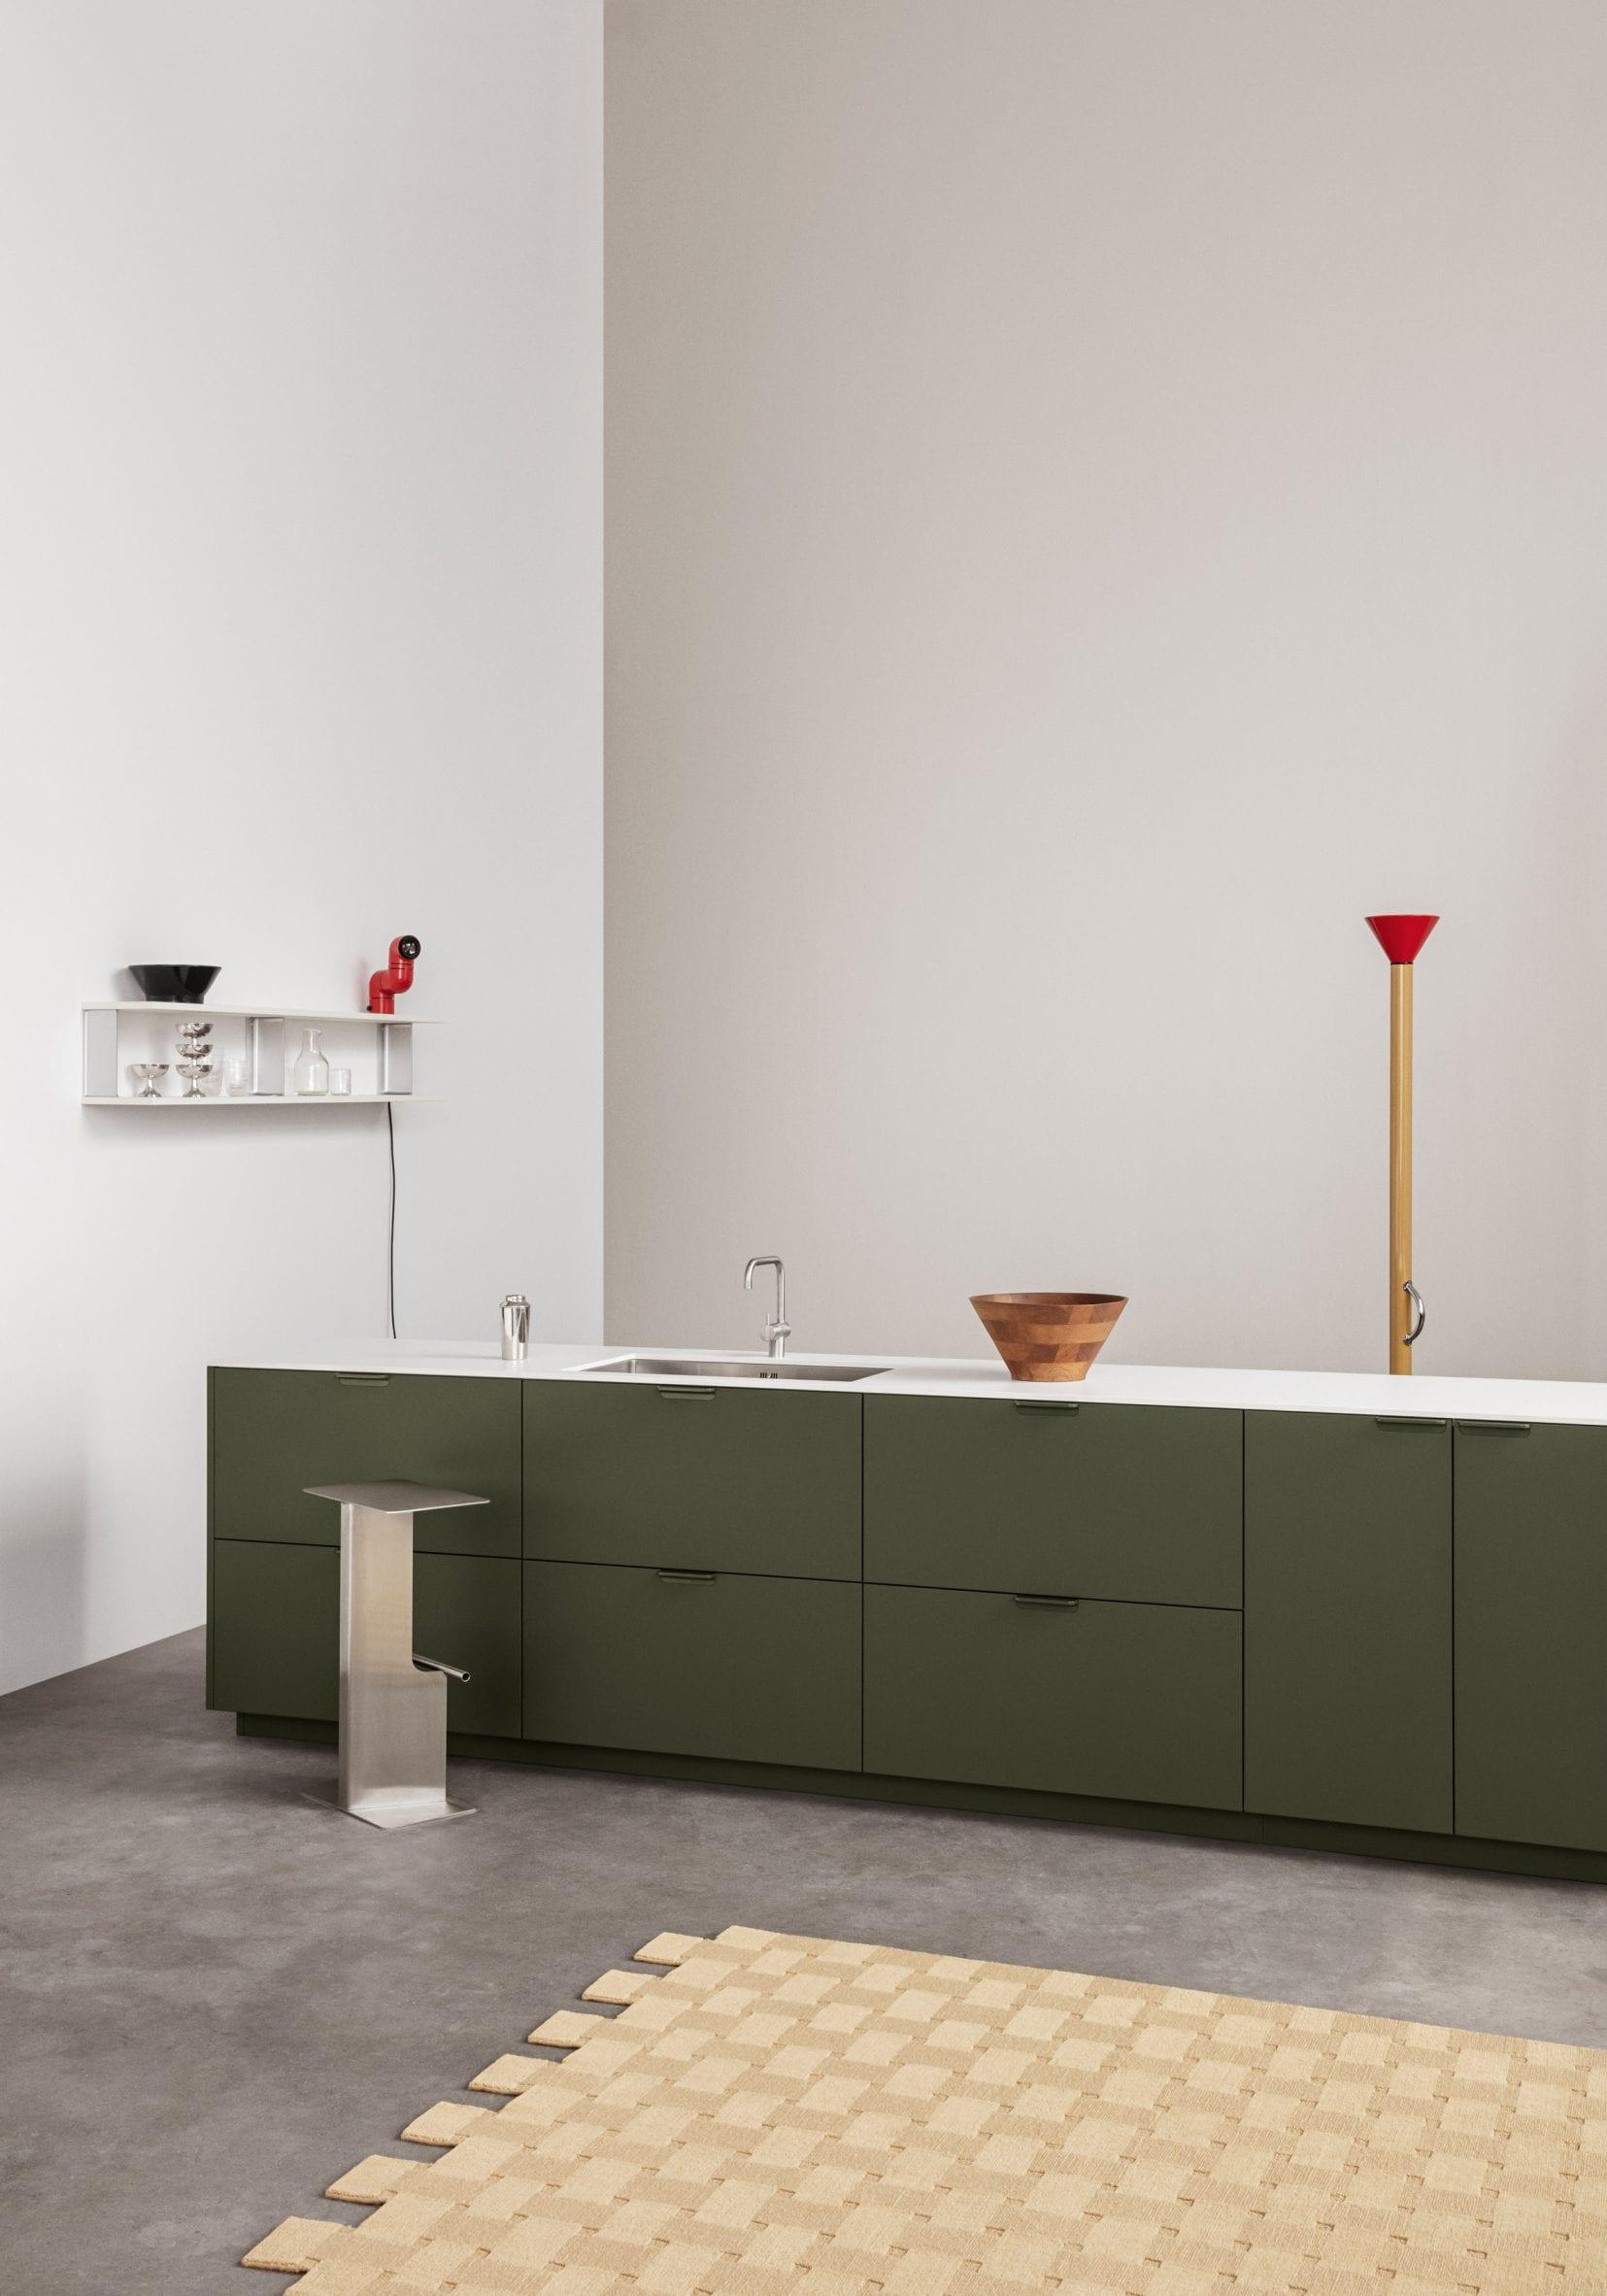 Green Unit kitchen by Reform